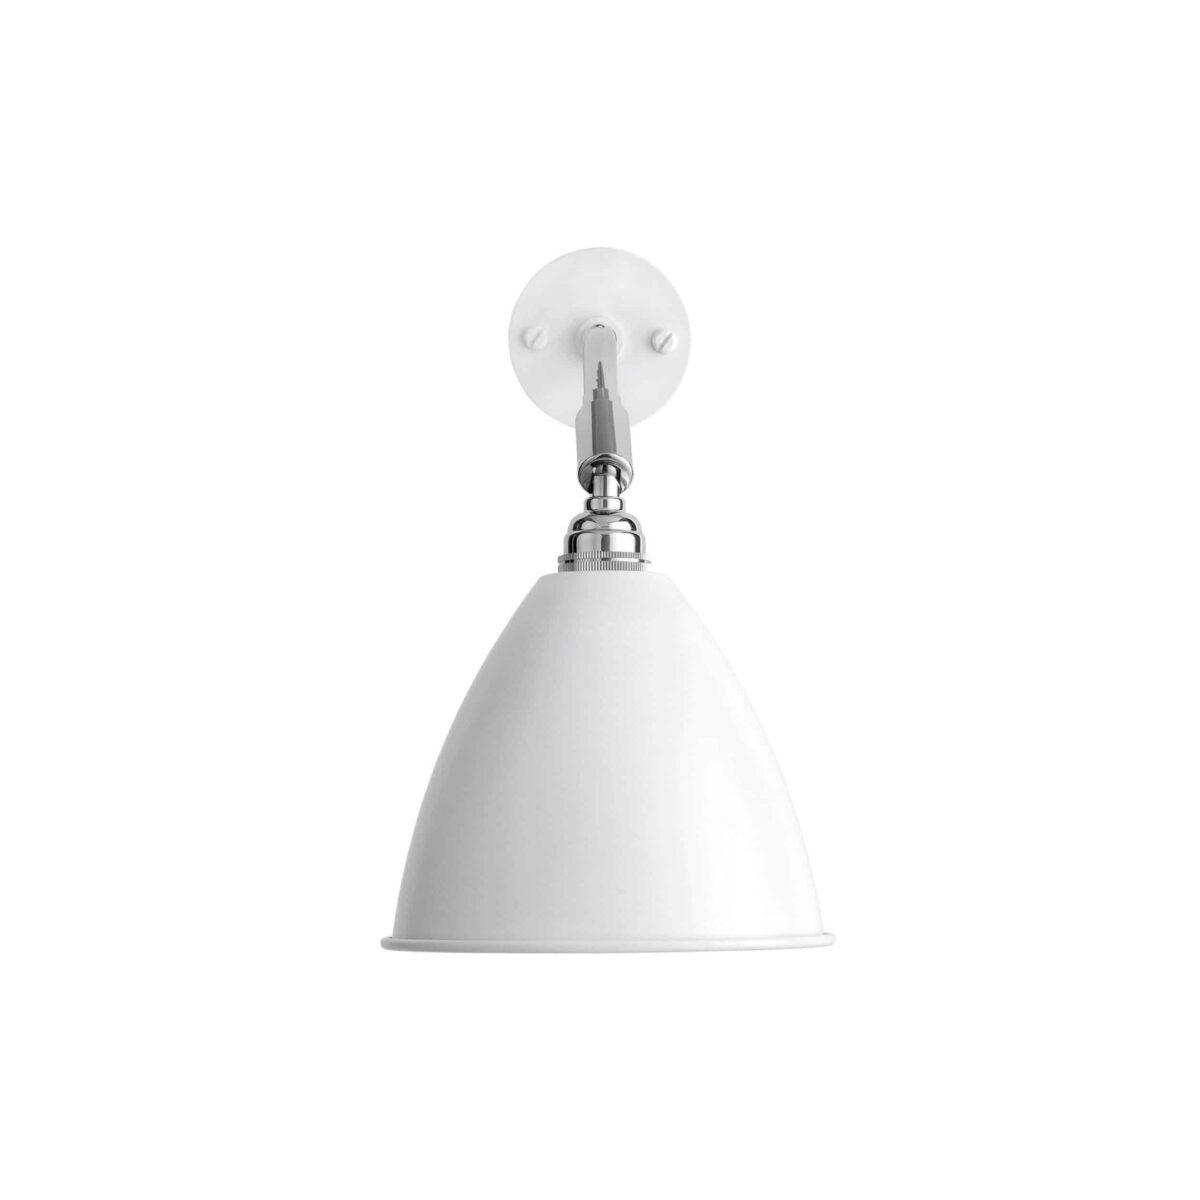 gubi-bestlite-wall-lamp-BL7-matt-white-chrome-01